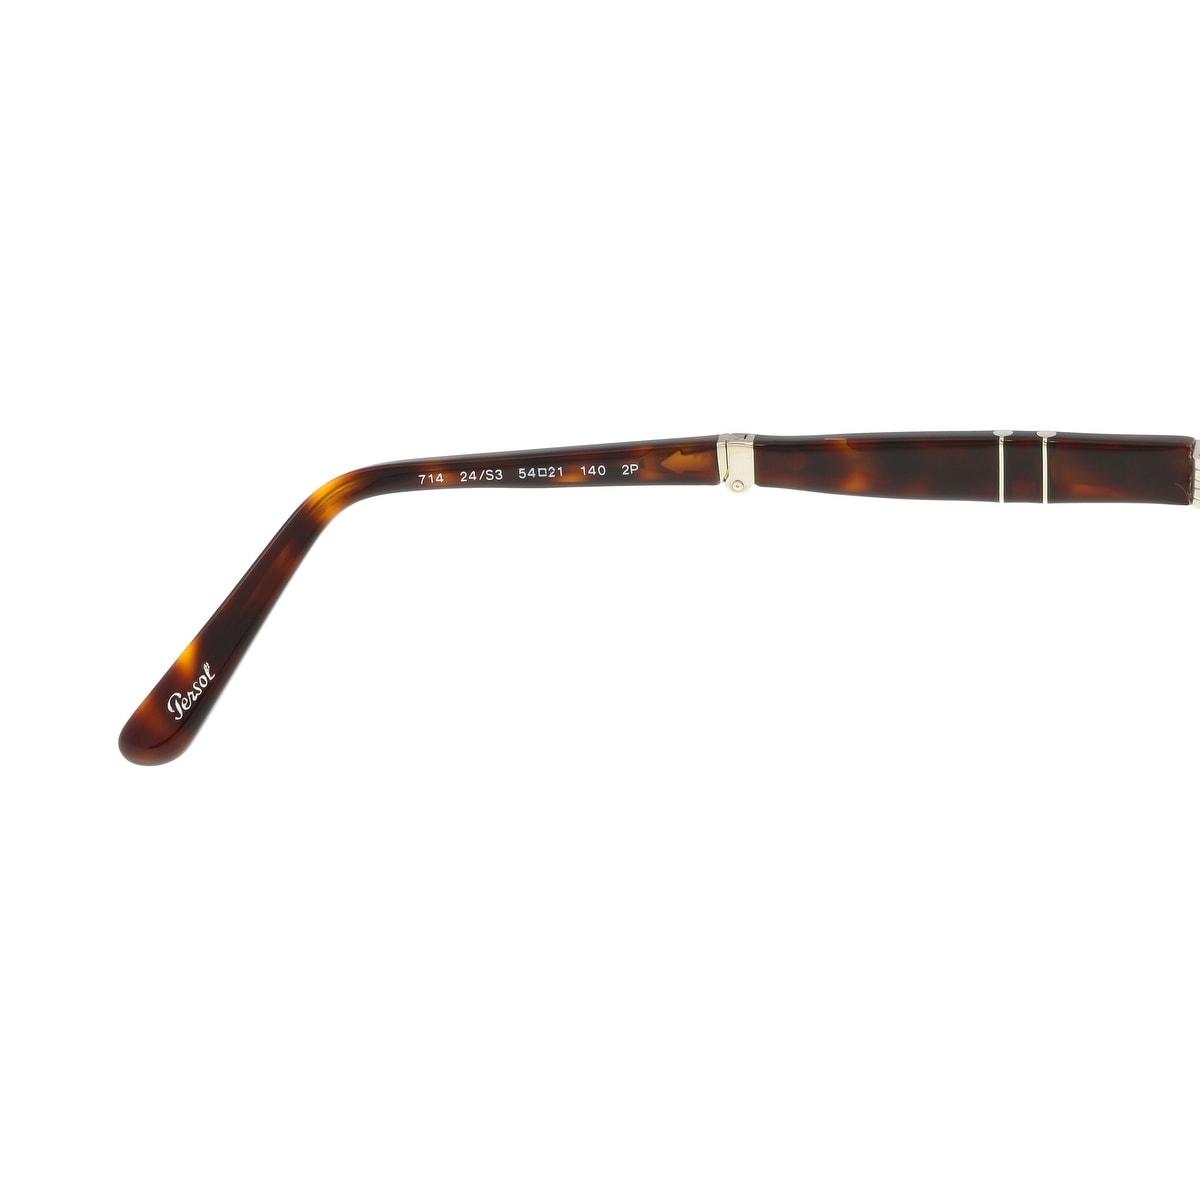 e5836e246c Shop Persol PO0714 24 S3 Havana Aviator Folding Steve McQueen Sunglasses -  54-21-140 - Free Shipping Today - Overstock - 17646158